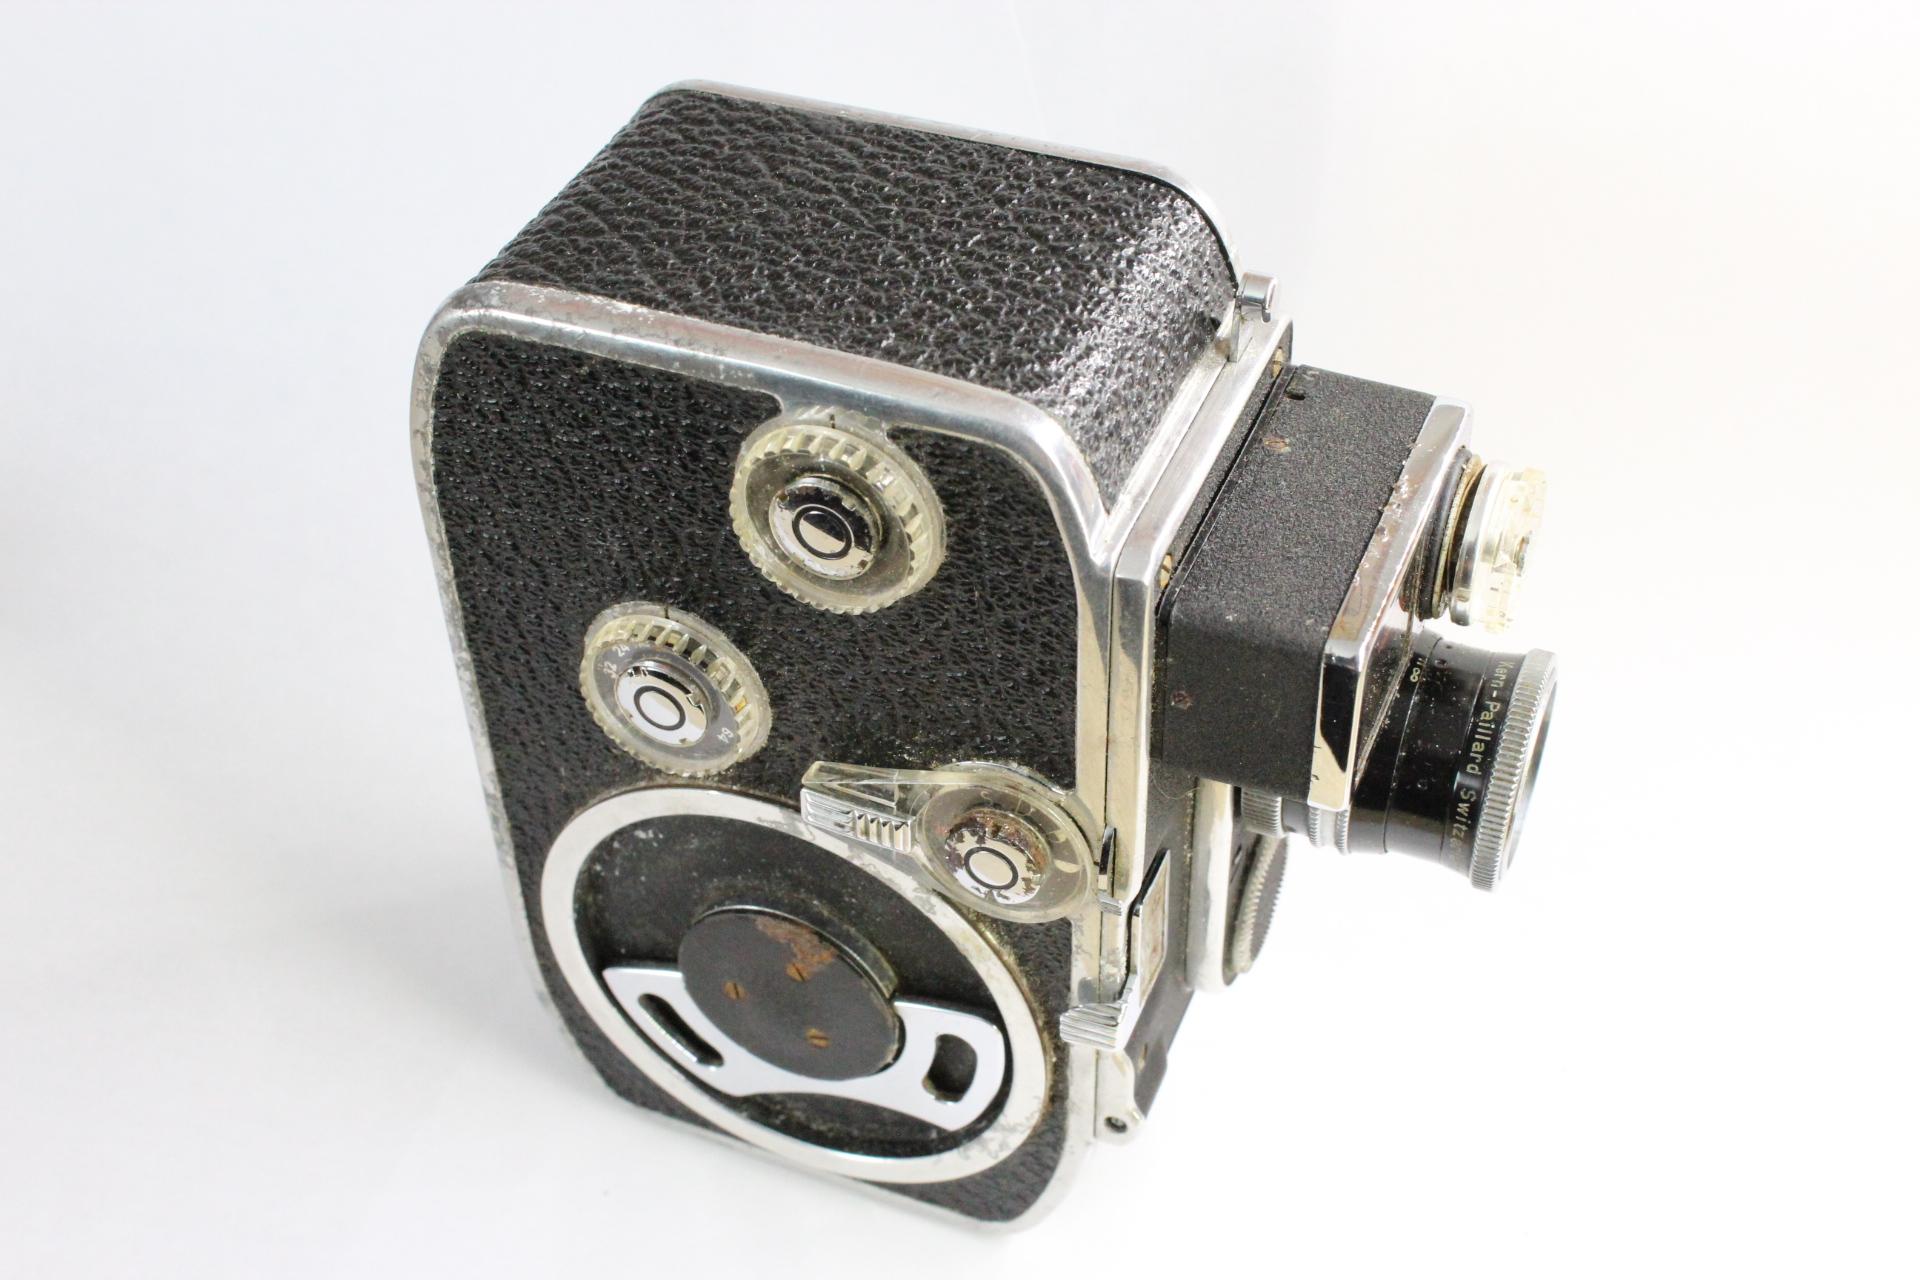 paillard bolex b8 l film movie cine 8mm camera with yvar 1 8 13mm lens photocapital. Black Bedroom Furniture Sets. Home Design Ideas